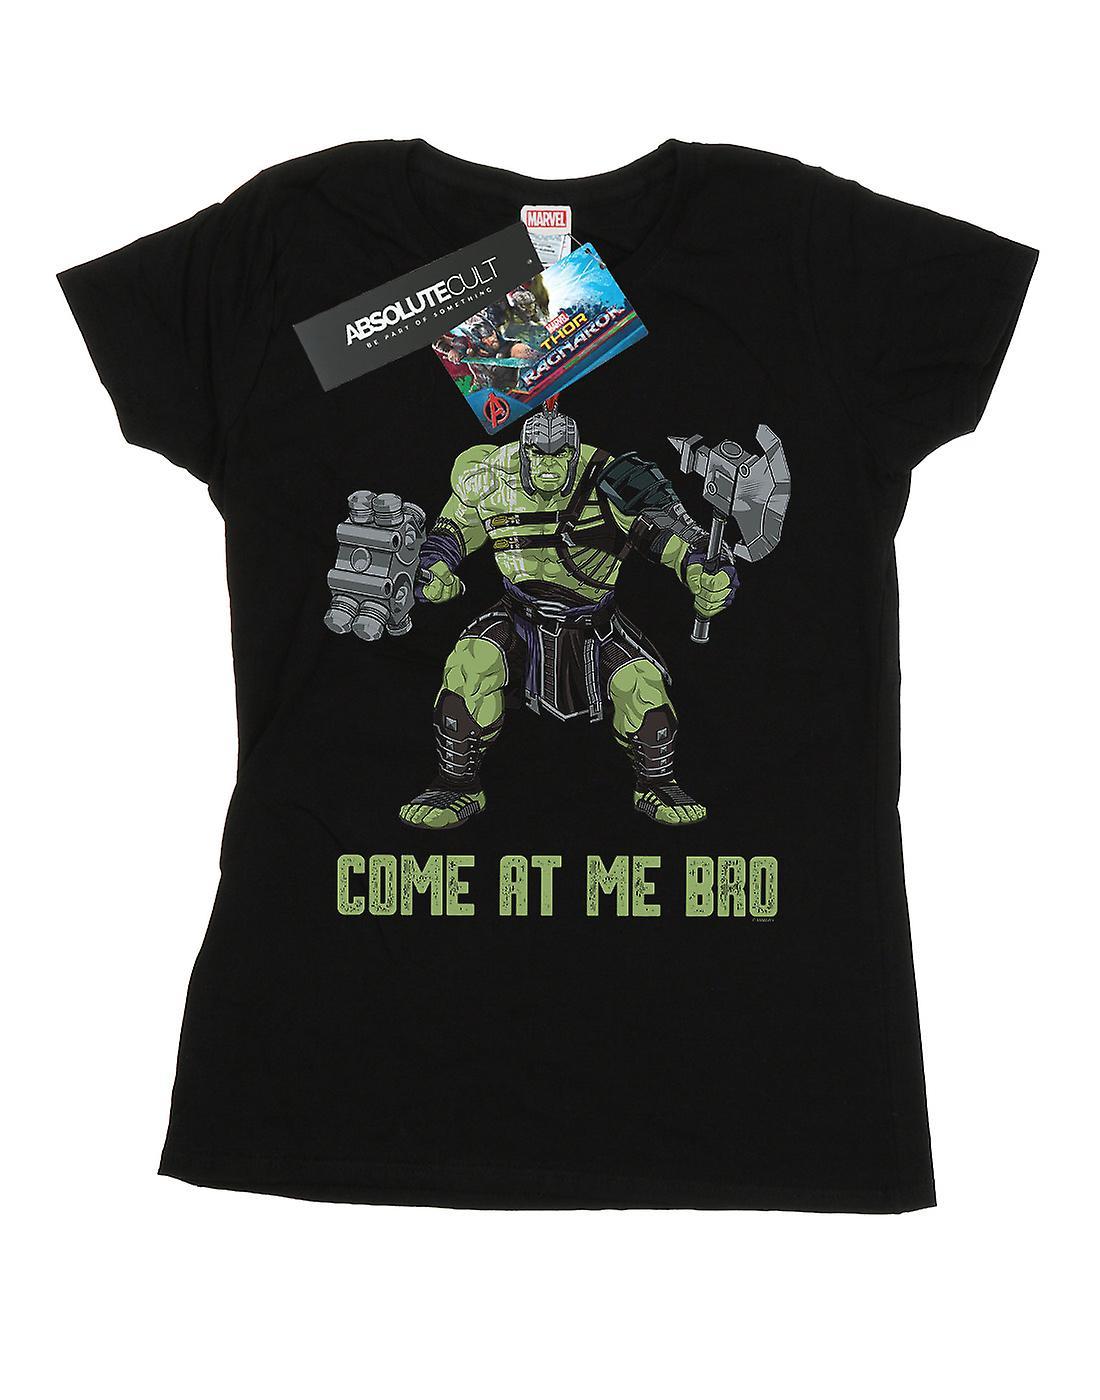 Marvel Women's Thor Ragnarok Come At Me Bro T-Shirt